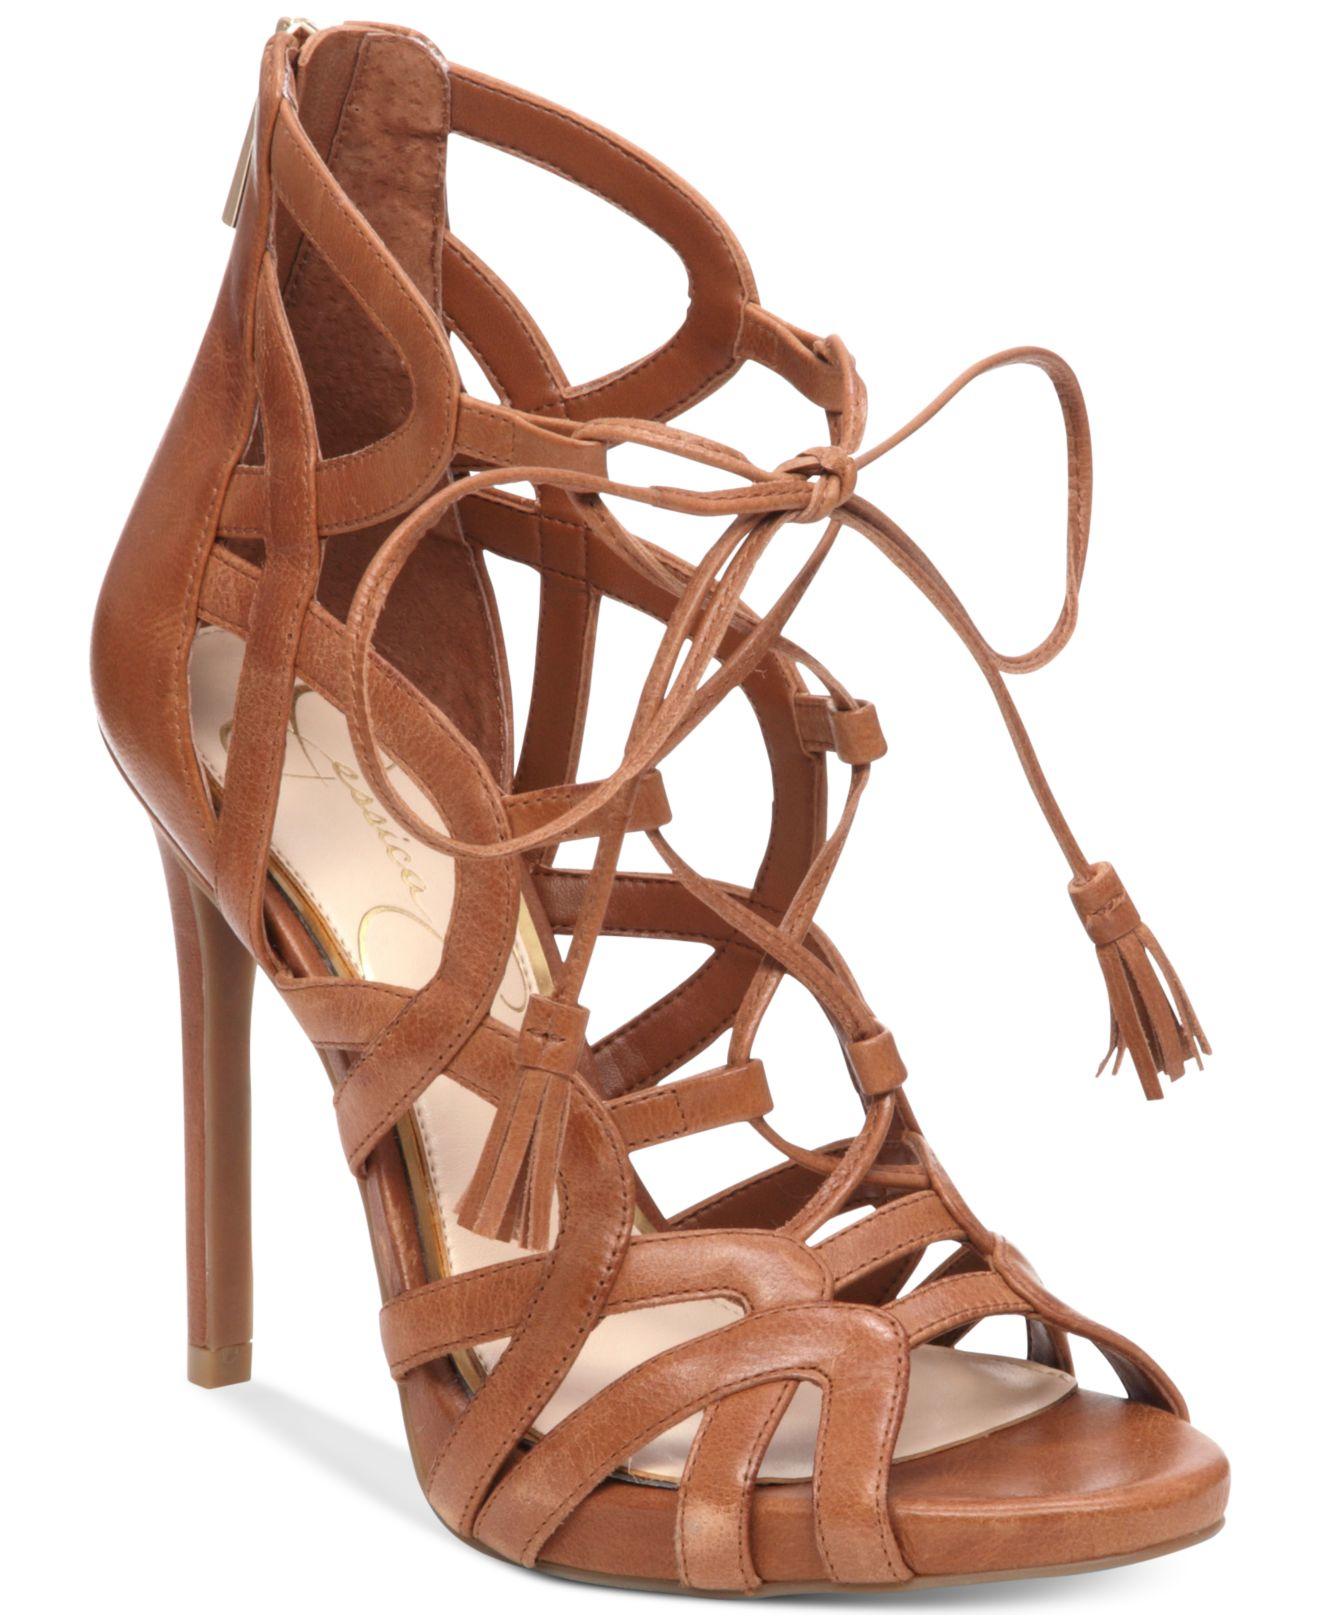 Jessica Simpson Racine Lace Up High Heel Gladiator Sandals